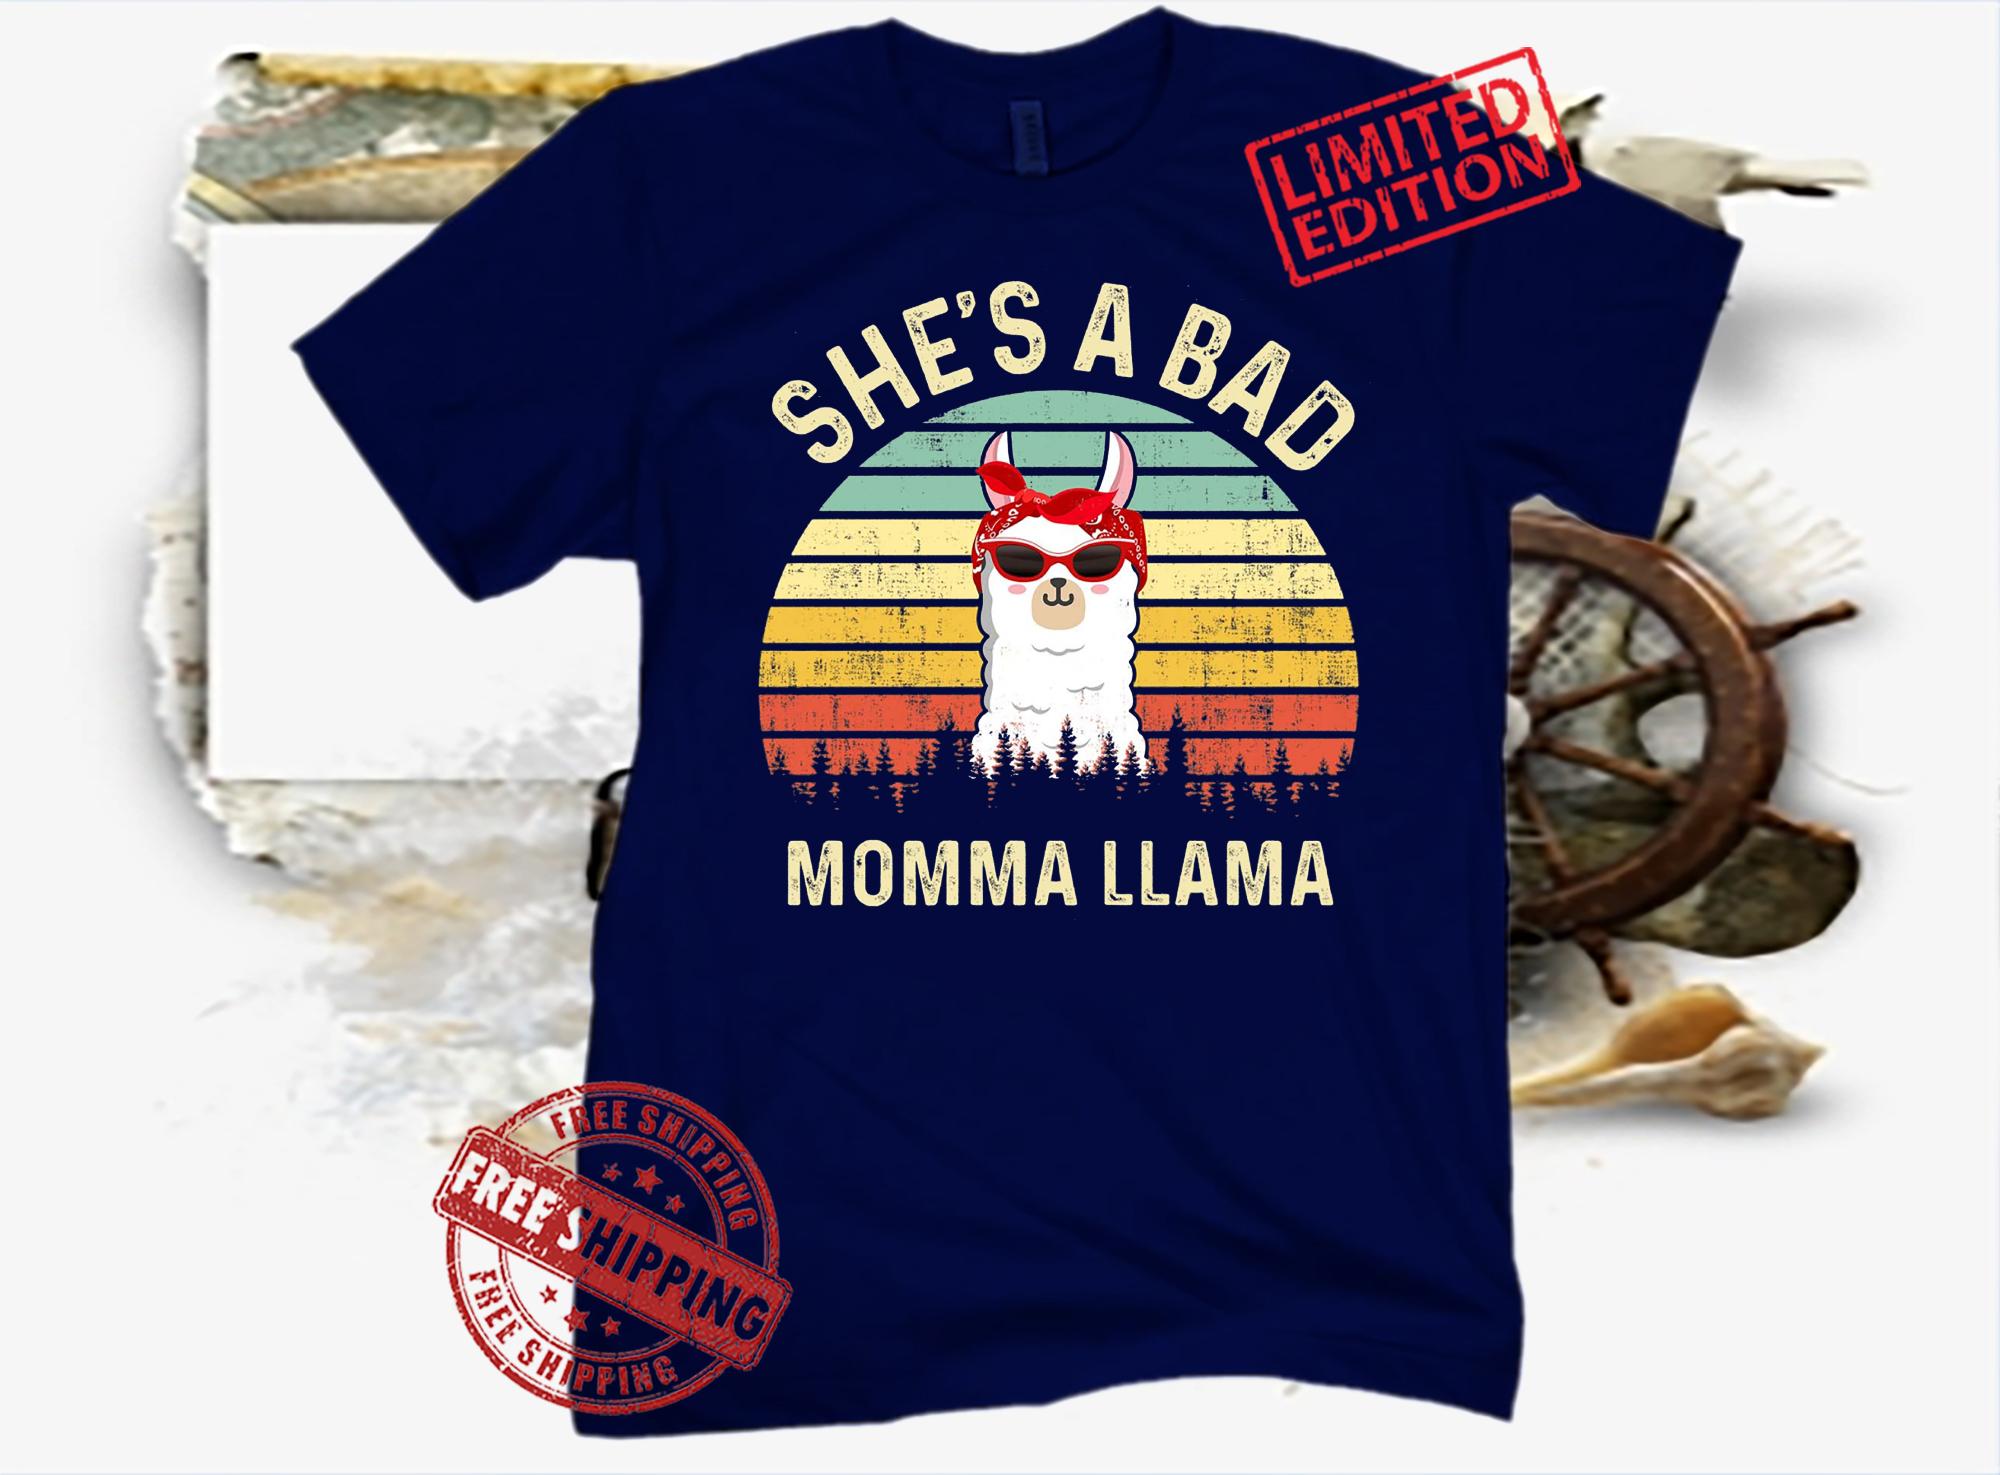 She A Bad Momma Llama Shirt, Funny Llama Shirt, Llama Mom Shirt, Mama Llama Shirt, Mother's Day 2021 Shirt, Birthday Mom Shirt